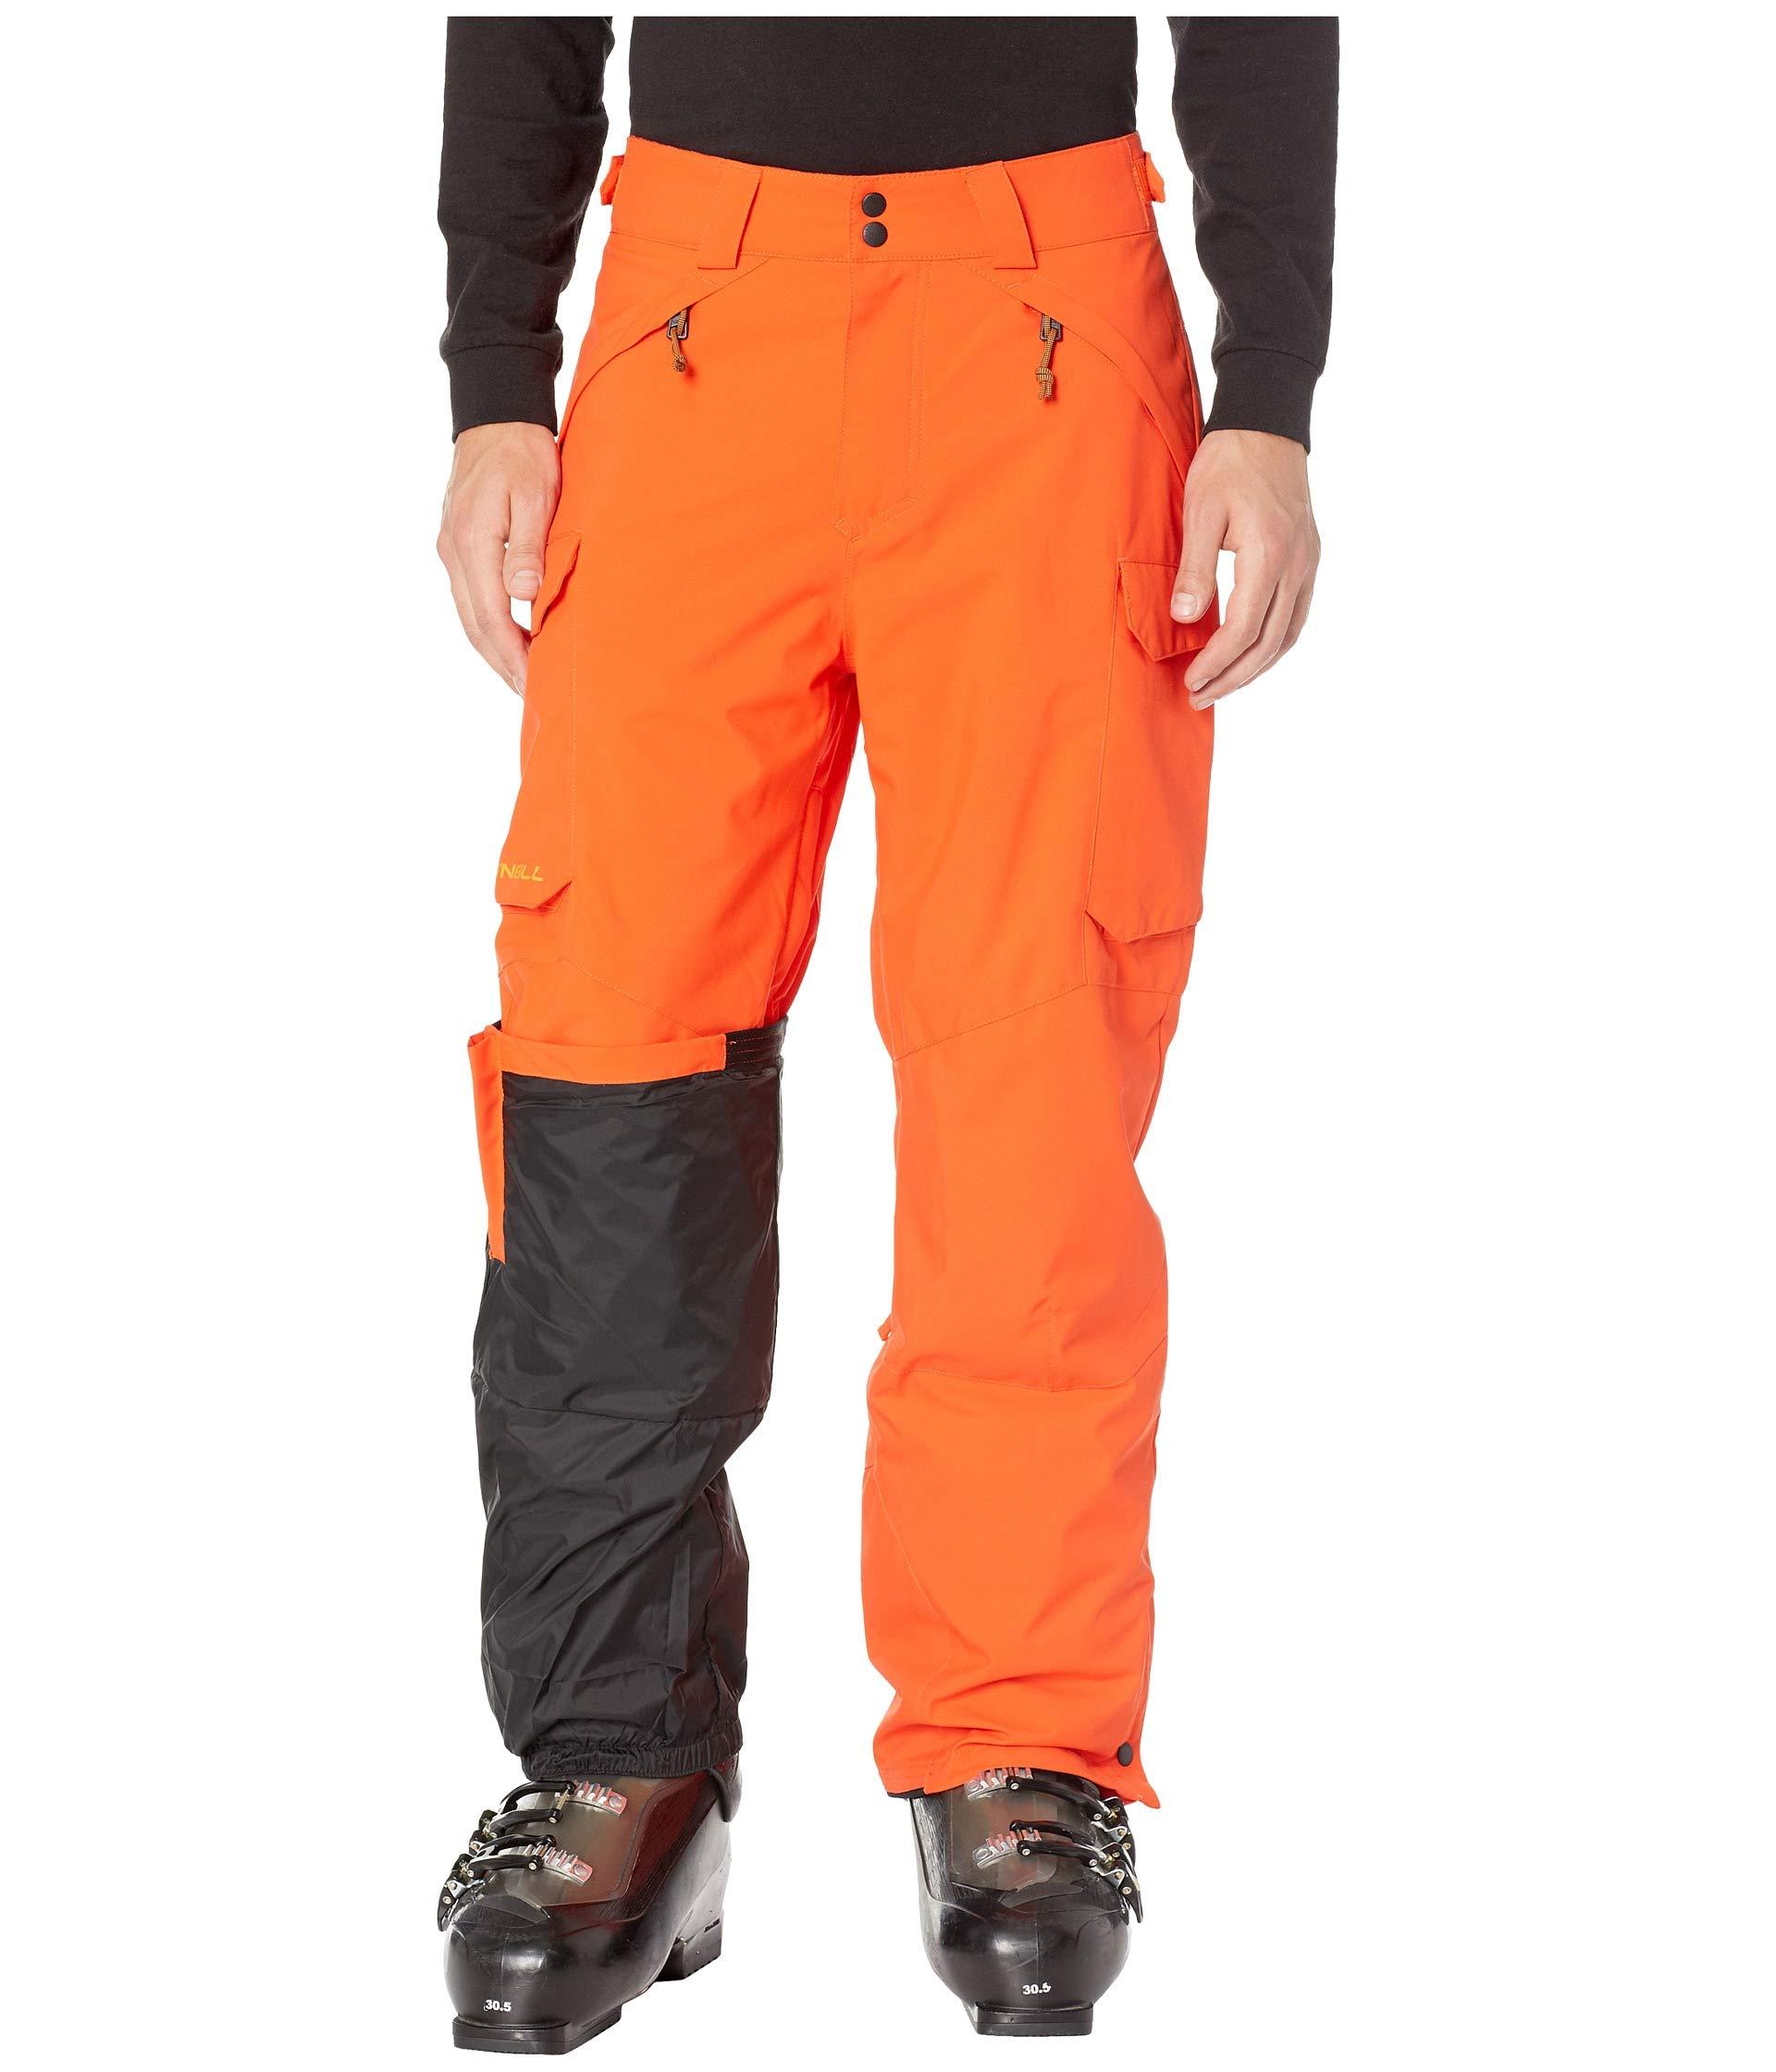 Exalt O'neill Exalt Pants Bright Pants Pants O'neill Bright Exalt Orange Pants Orange O'neill O'neill Exalt Orange Bright Opf4qO